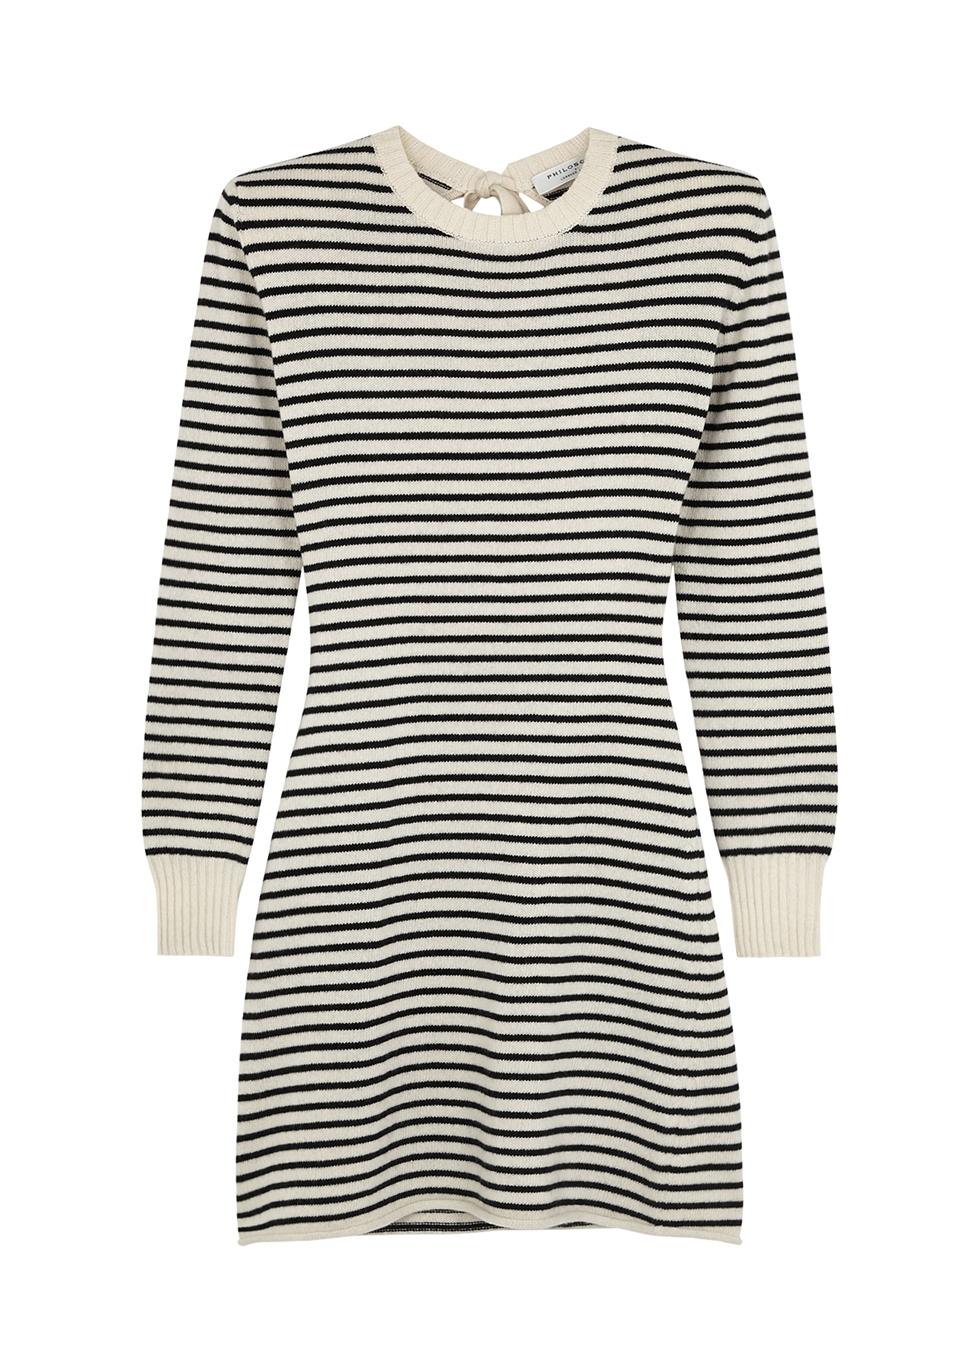 Striped cashmere-blend jumper dress